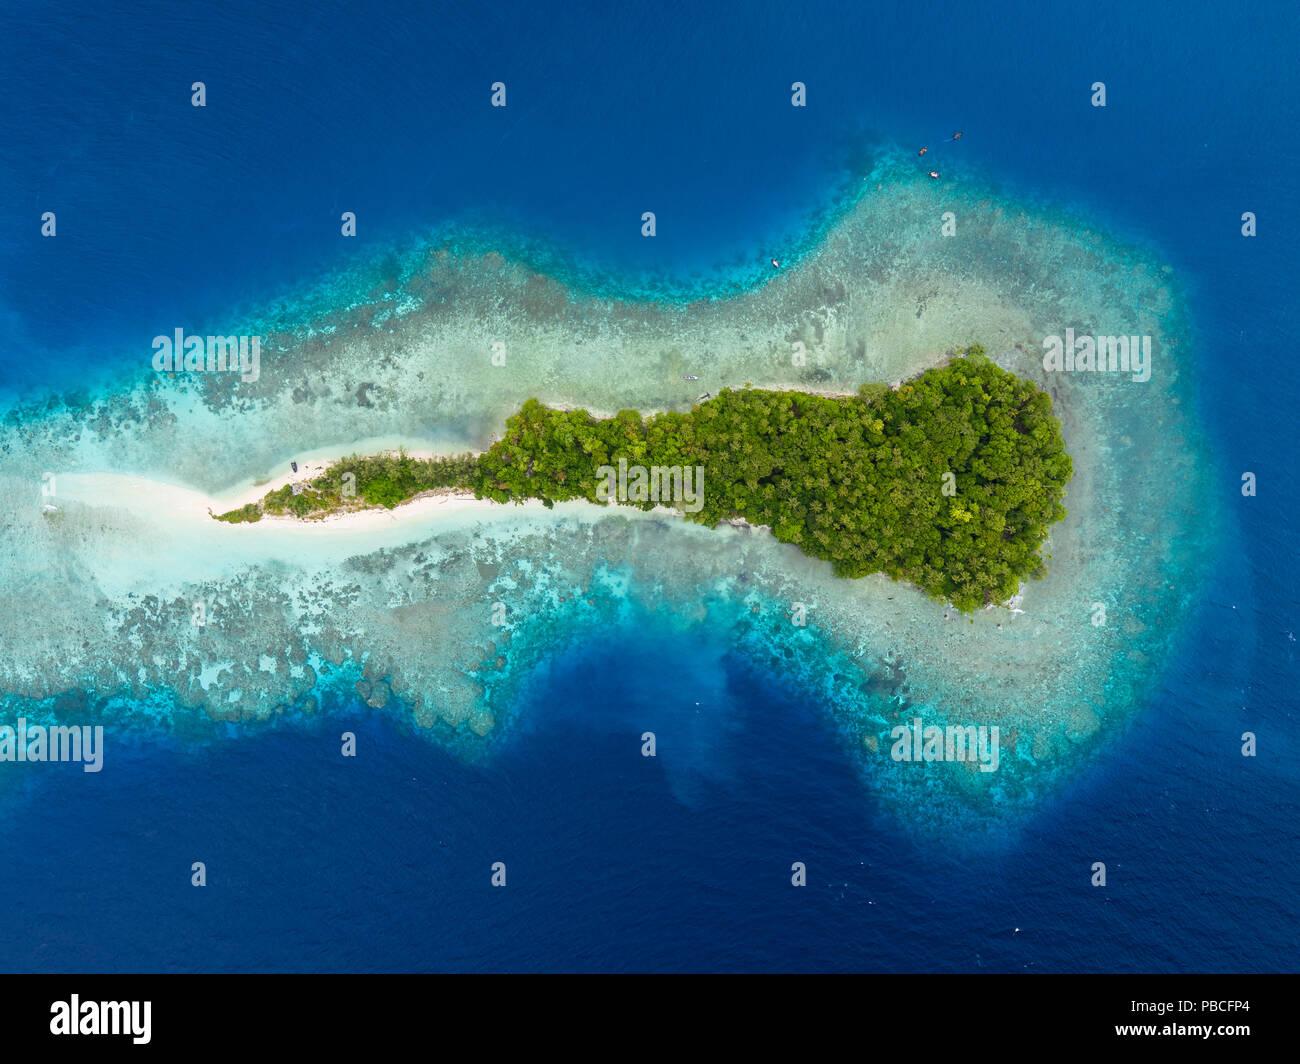 Aerial image of Njari Island, Solomon Islands - Stock Image